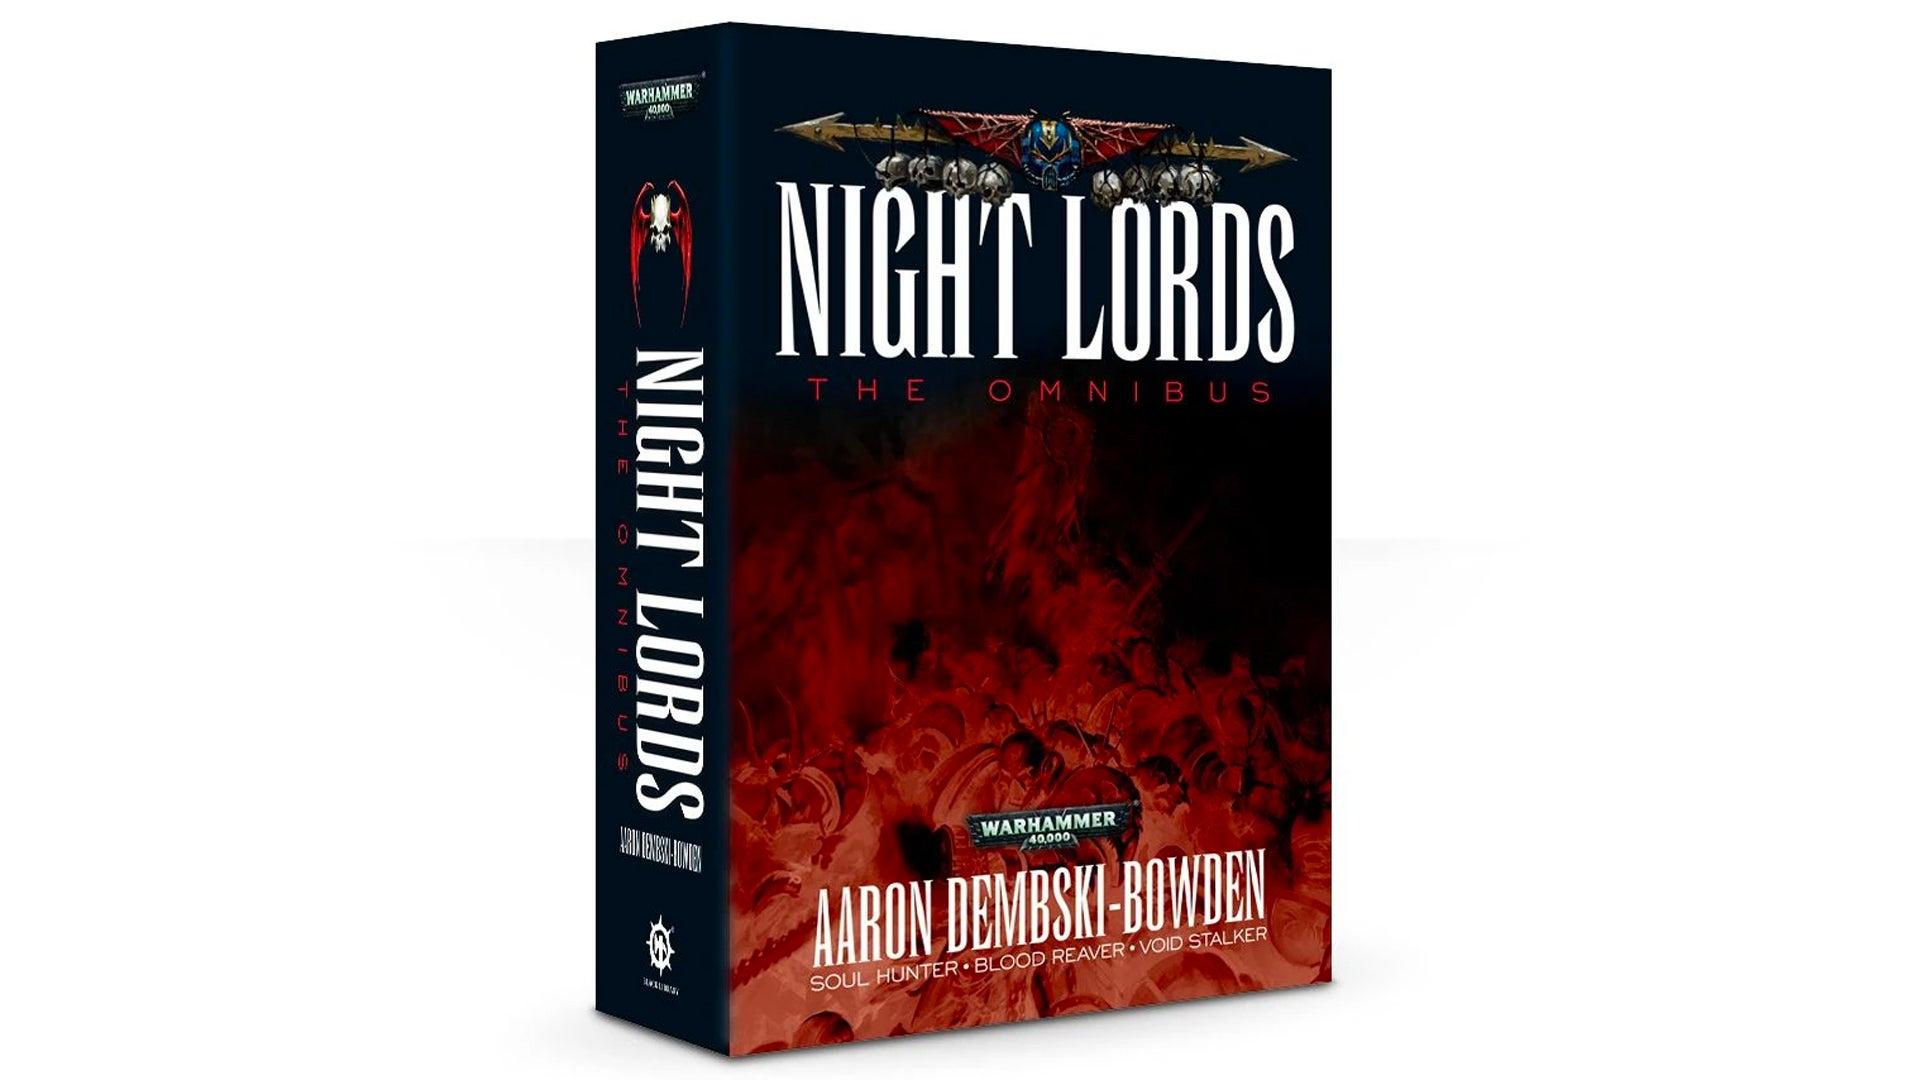 warhammer-40k-book-black-library-night-lords-omnibus.jpg